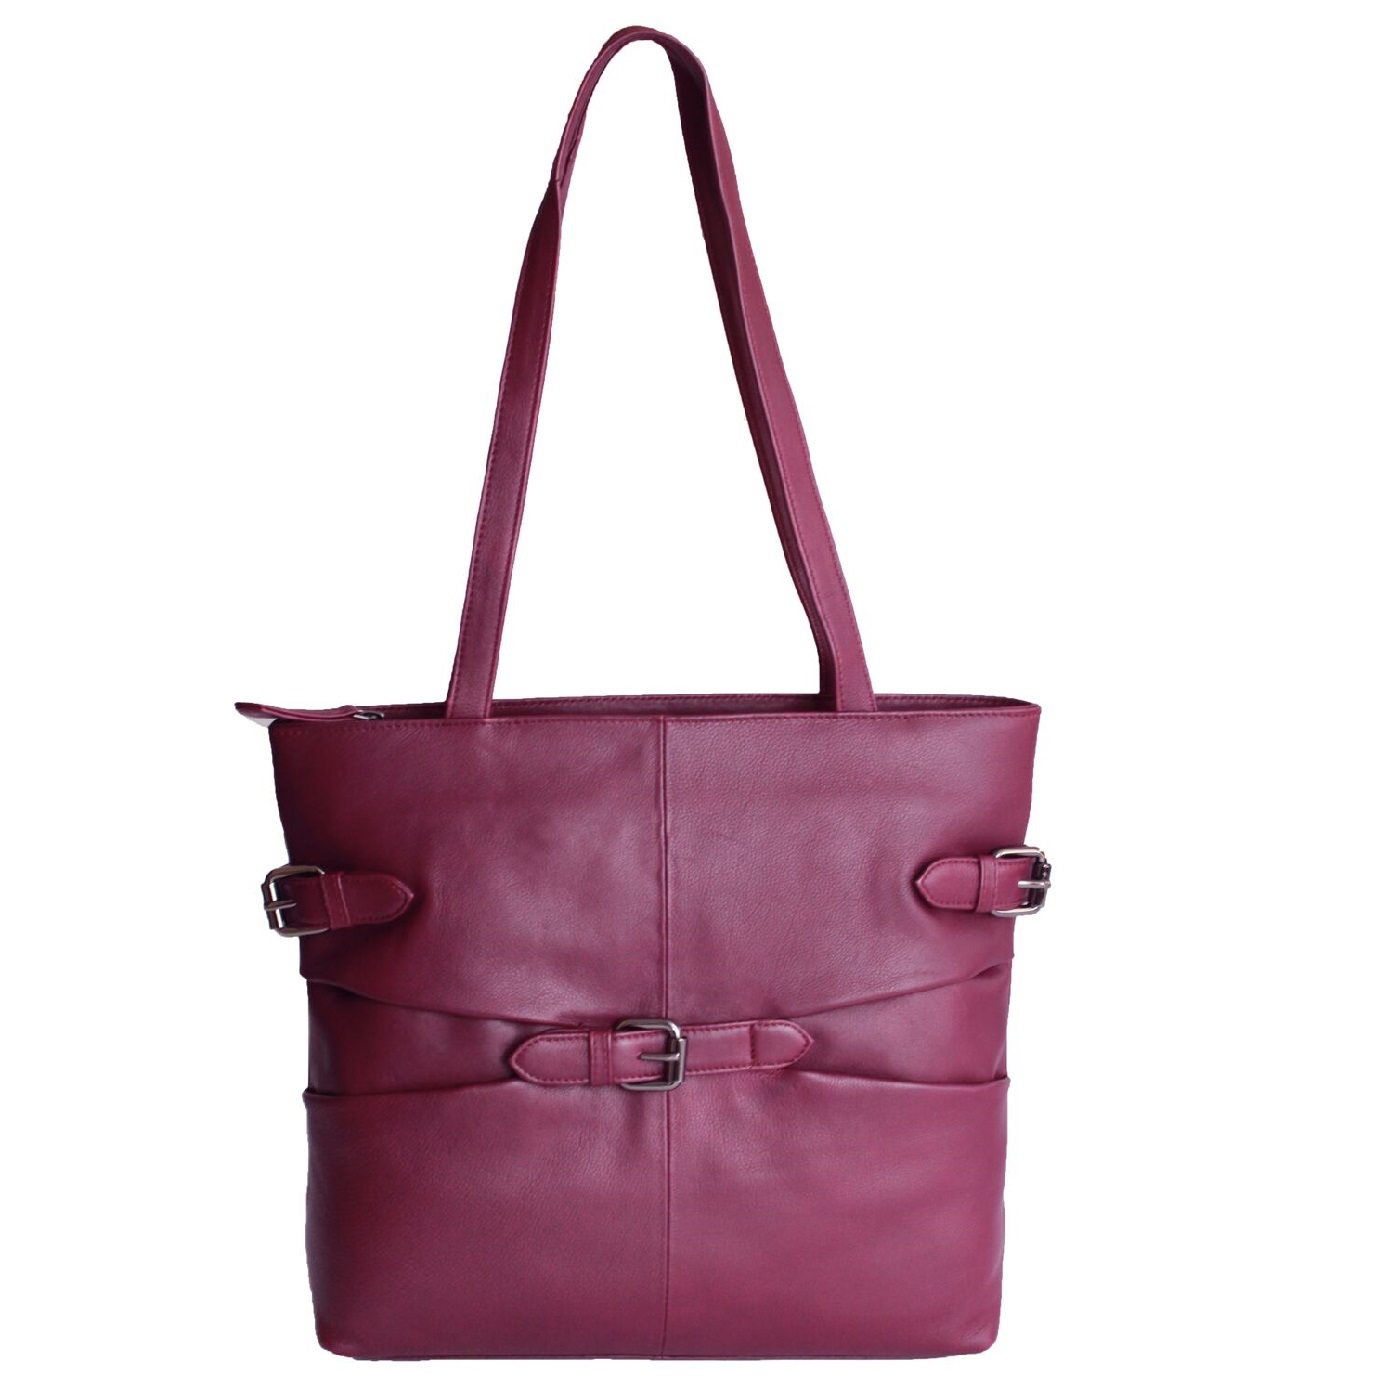 Eastern Counties Leather Womens/Ladies Jill Tote Style Handbag (One size) (Burgundy)